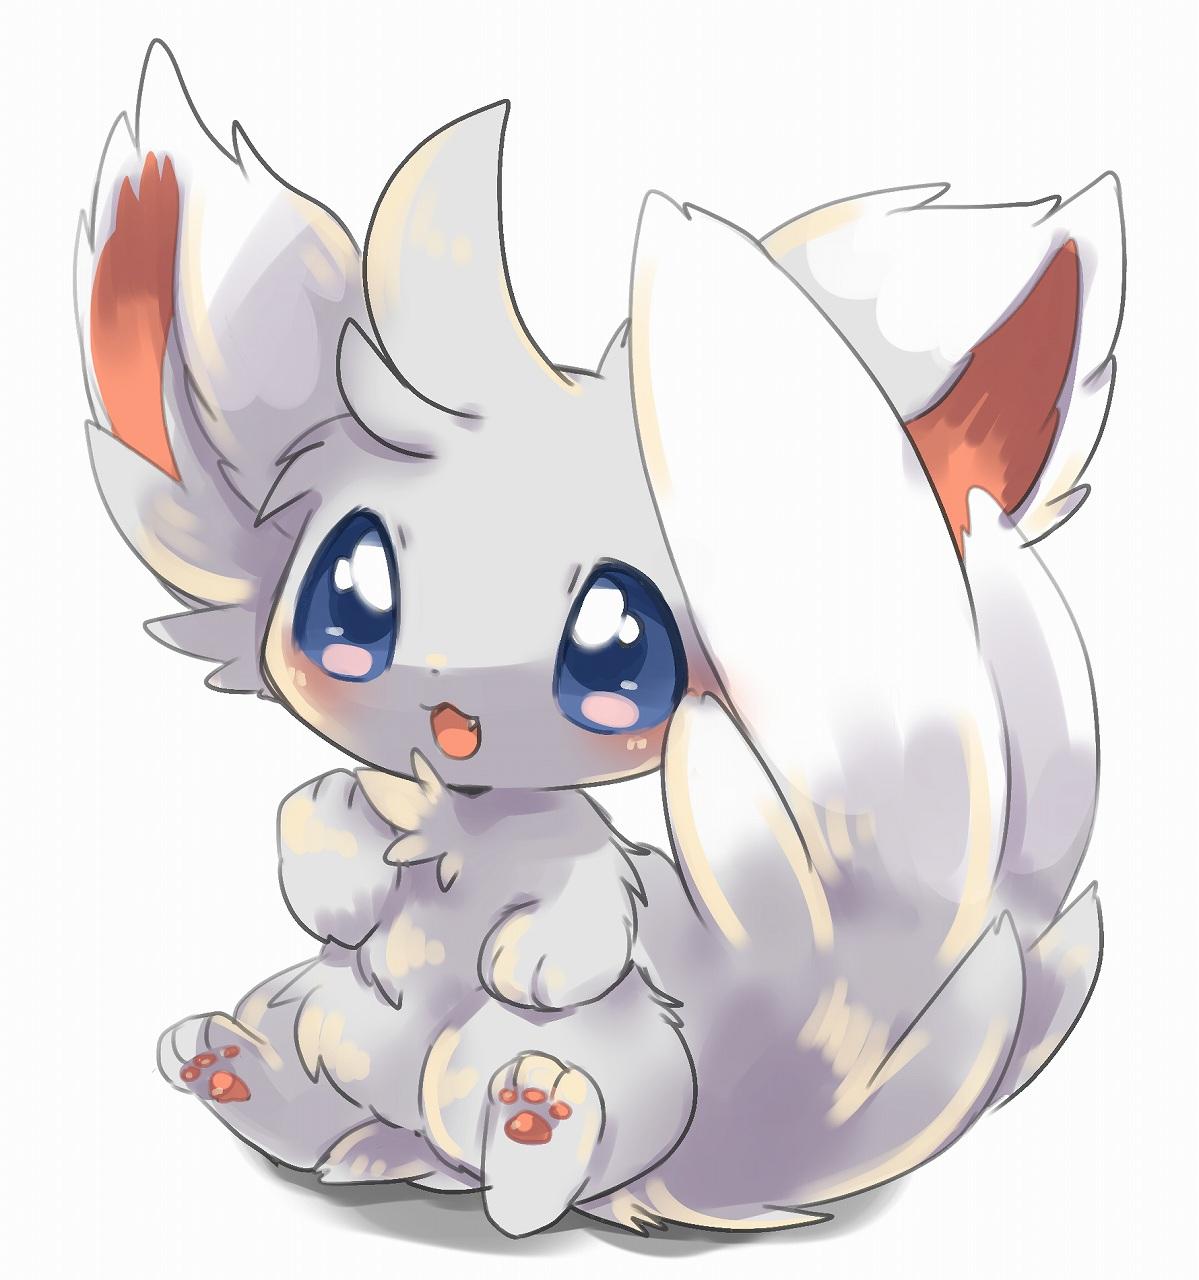 minccino pokémon zerochan anime image board